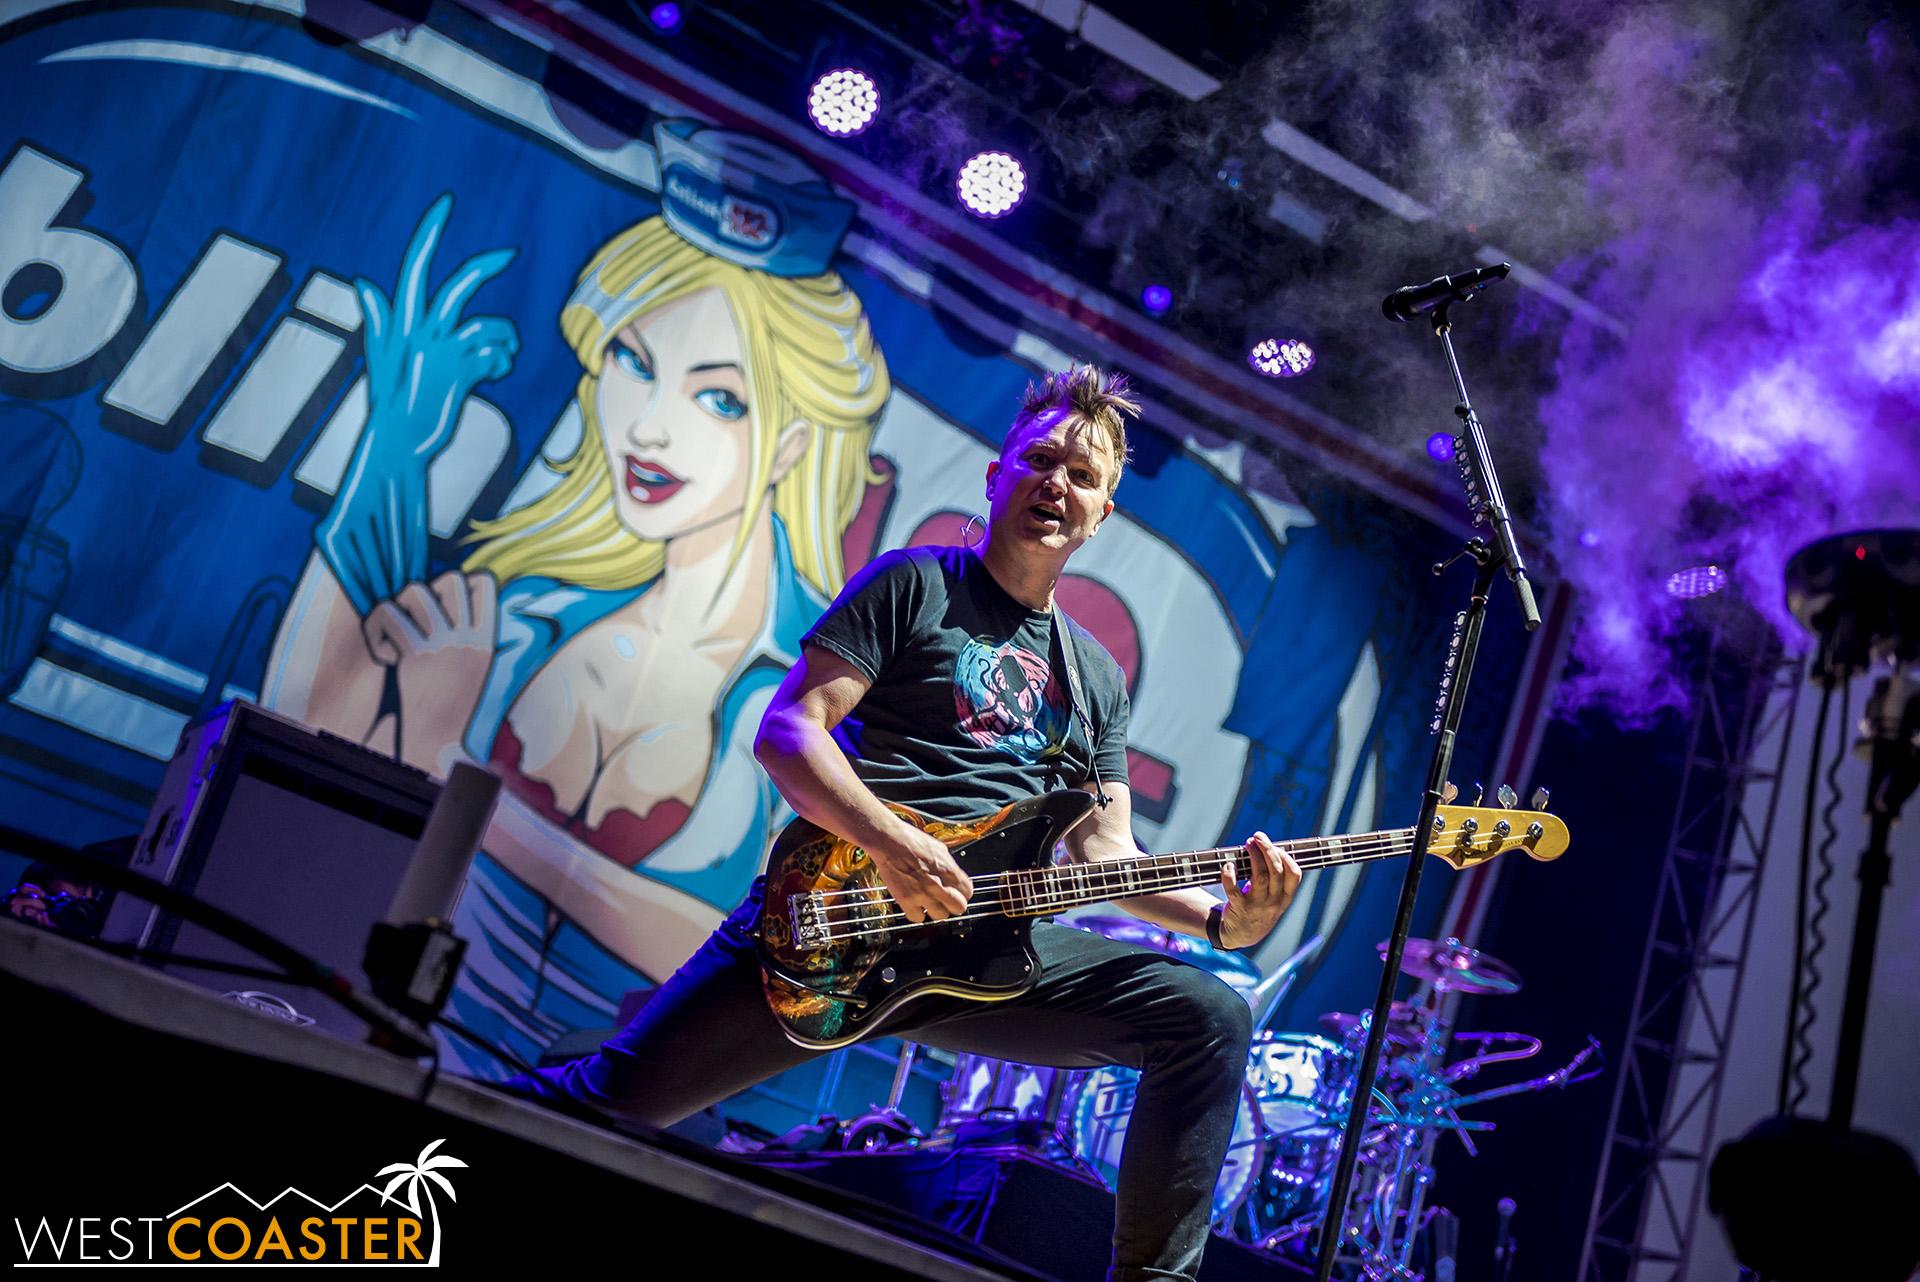 Mark Hoppus striking a power pose on guitar.